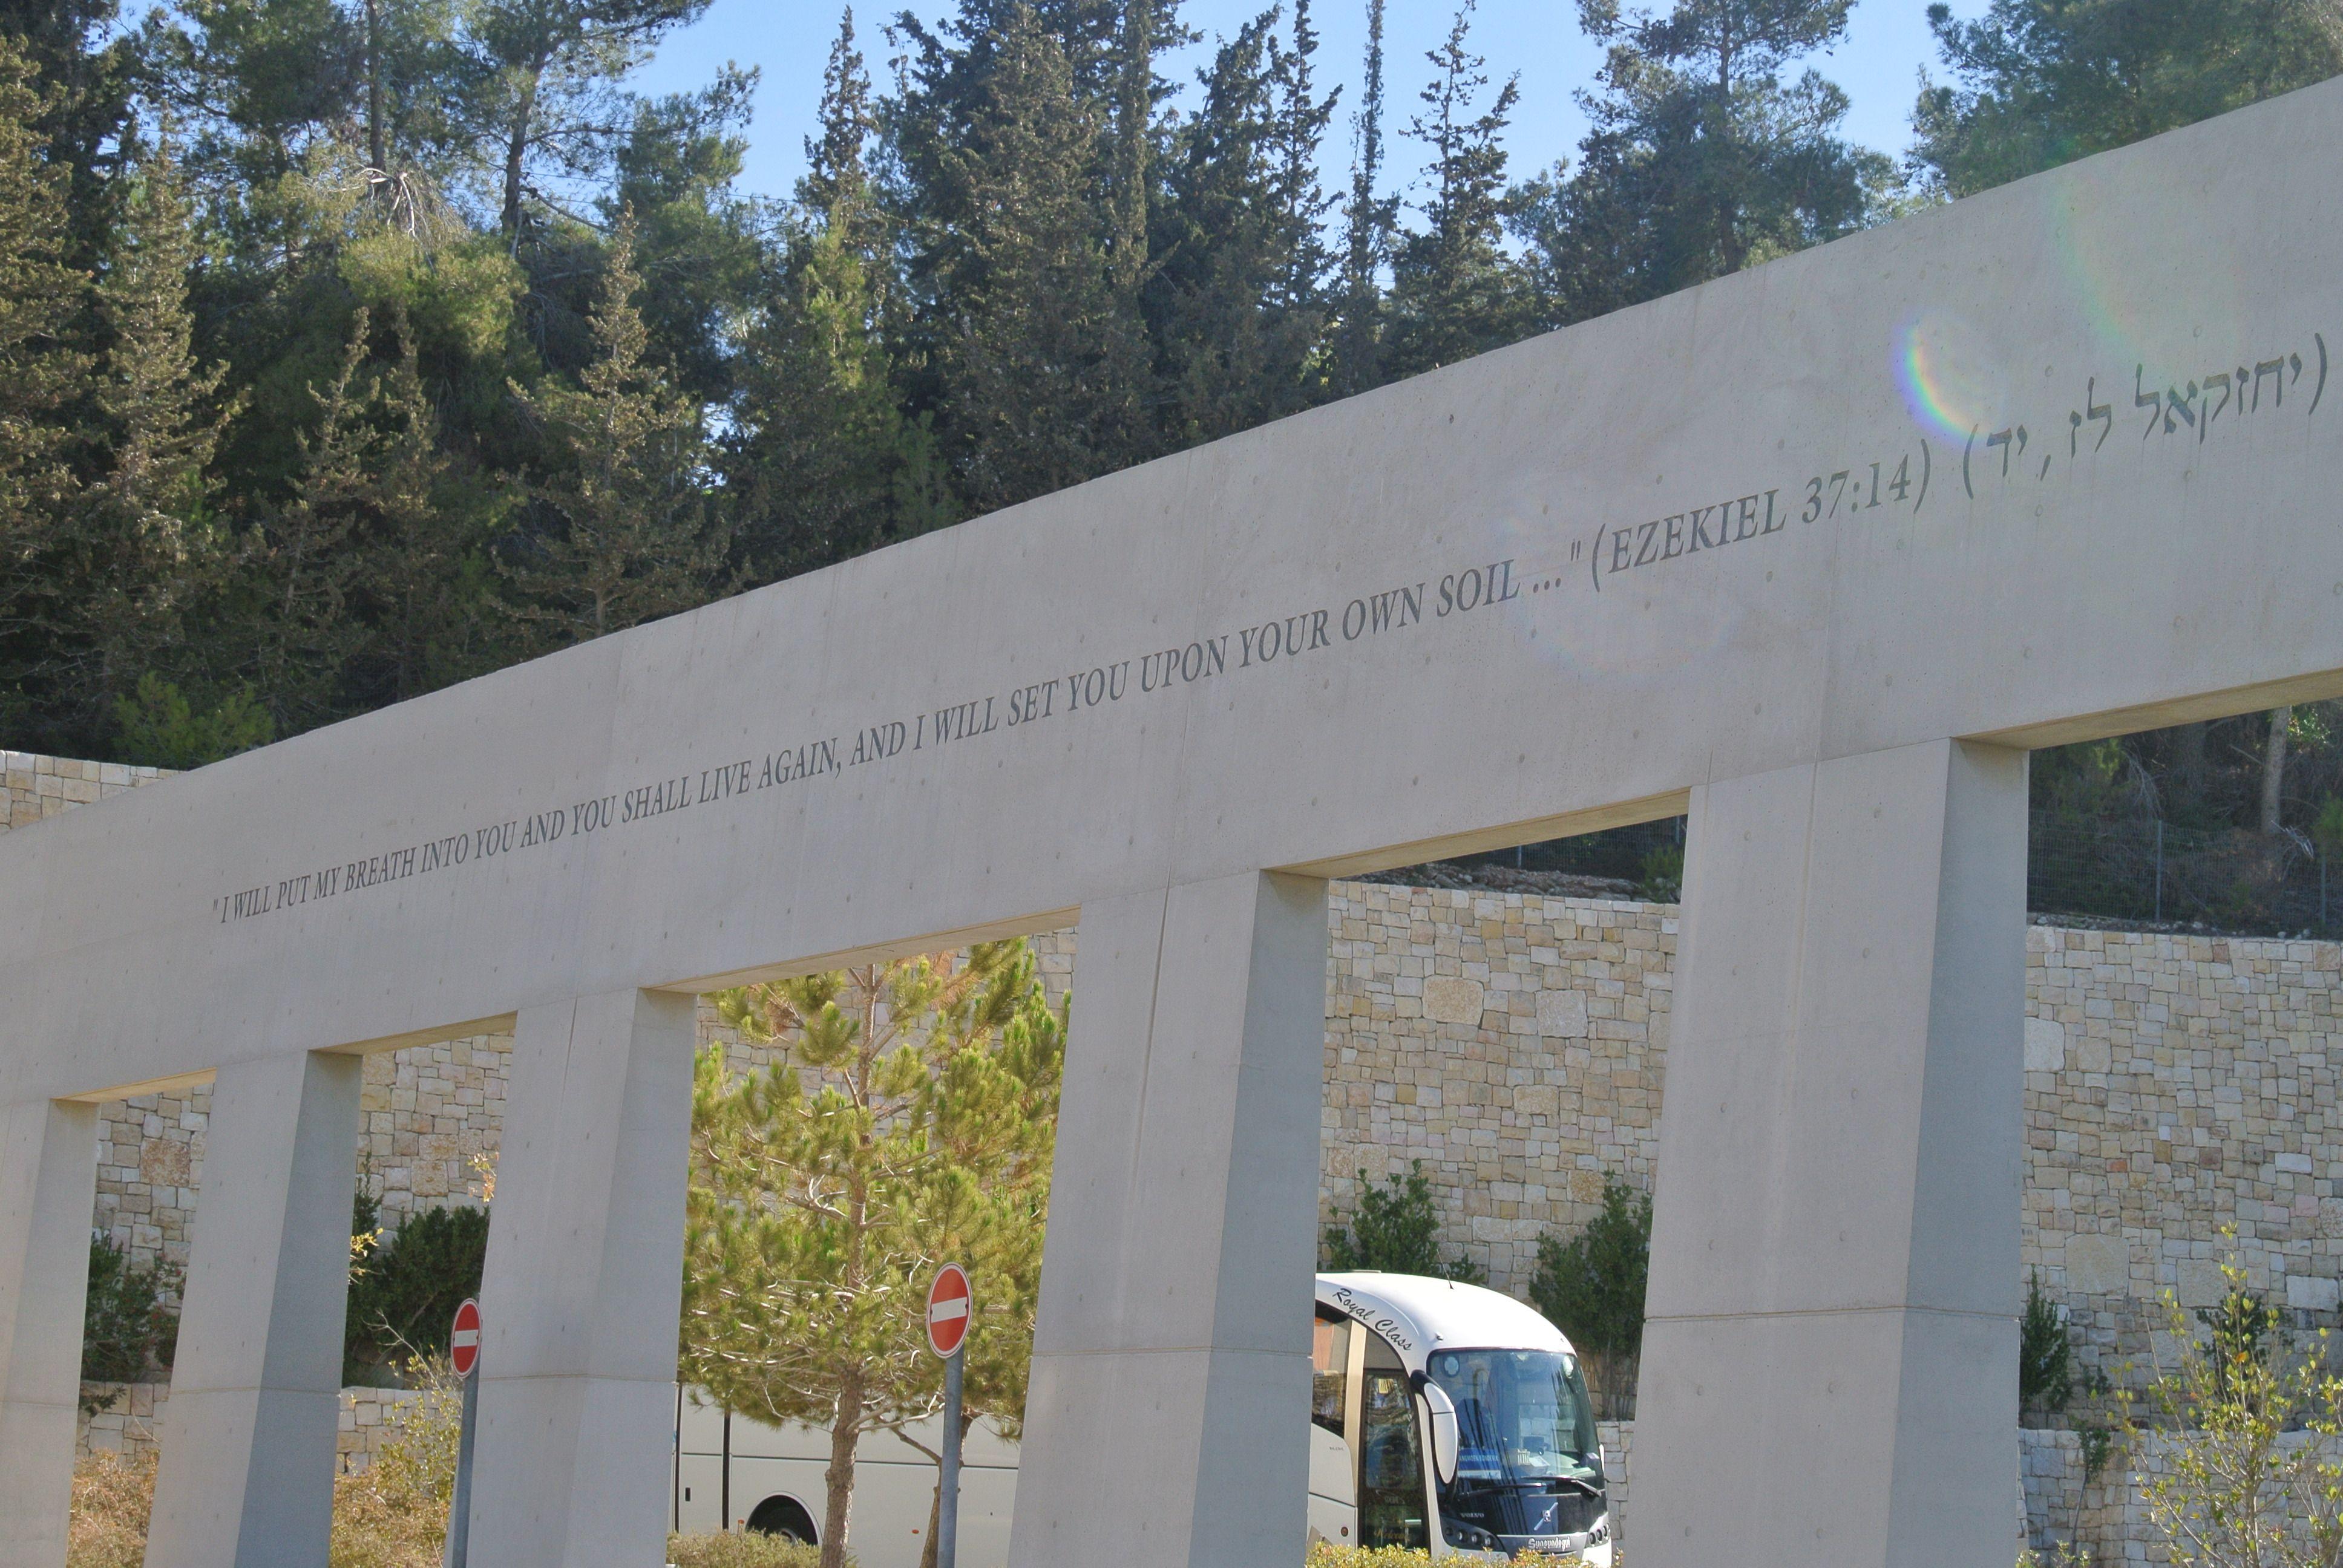 profetie over Israel bij Yad va shem.